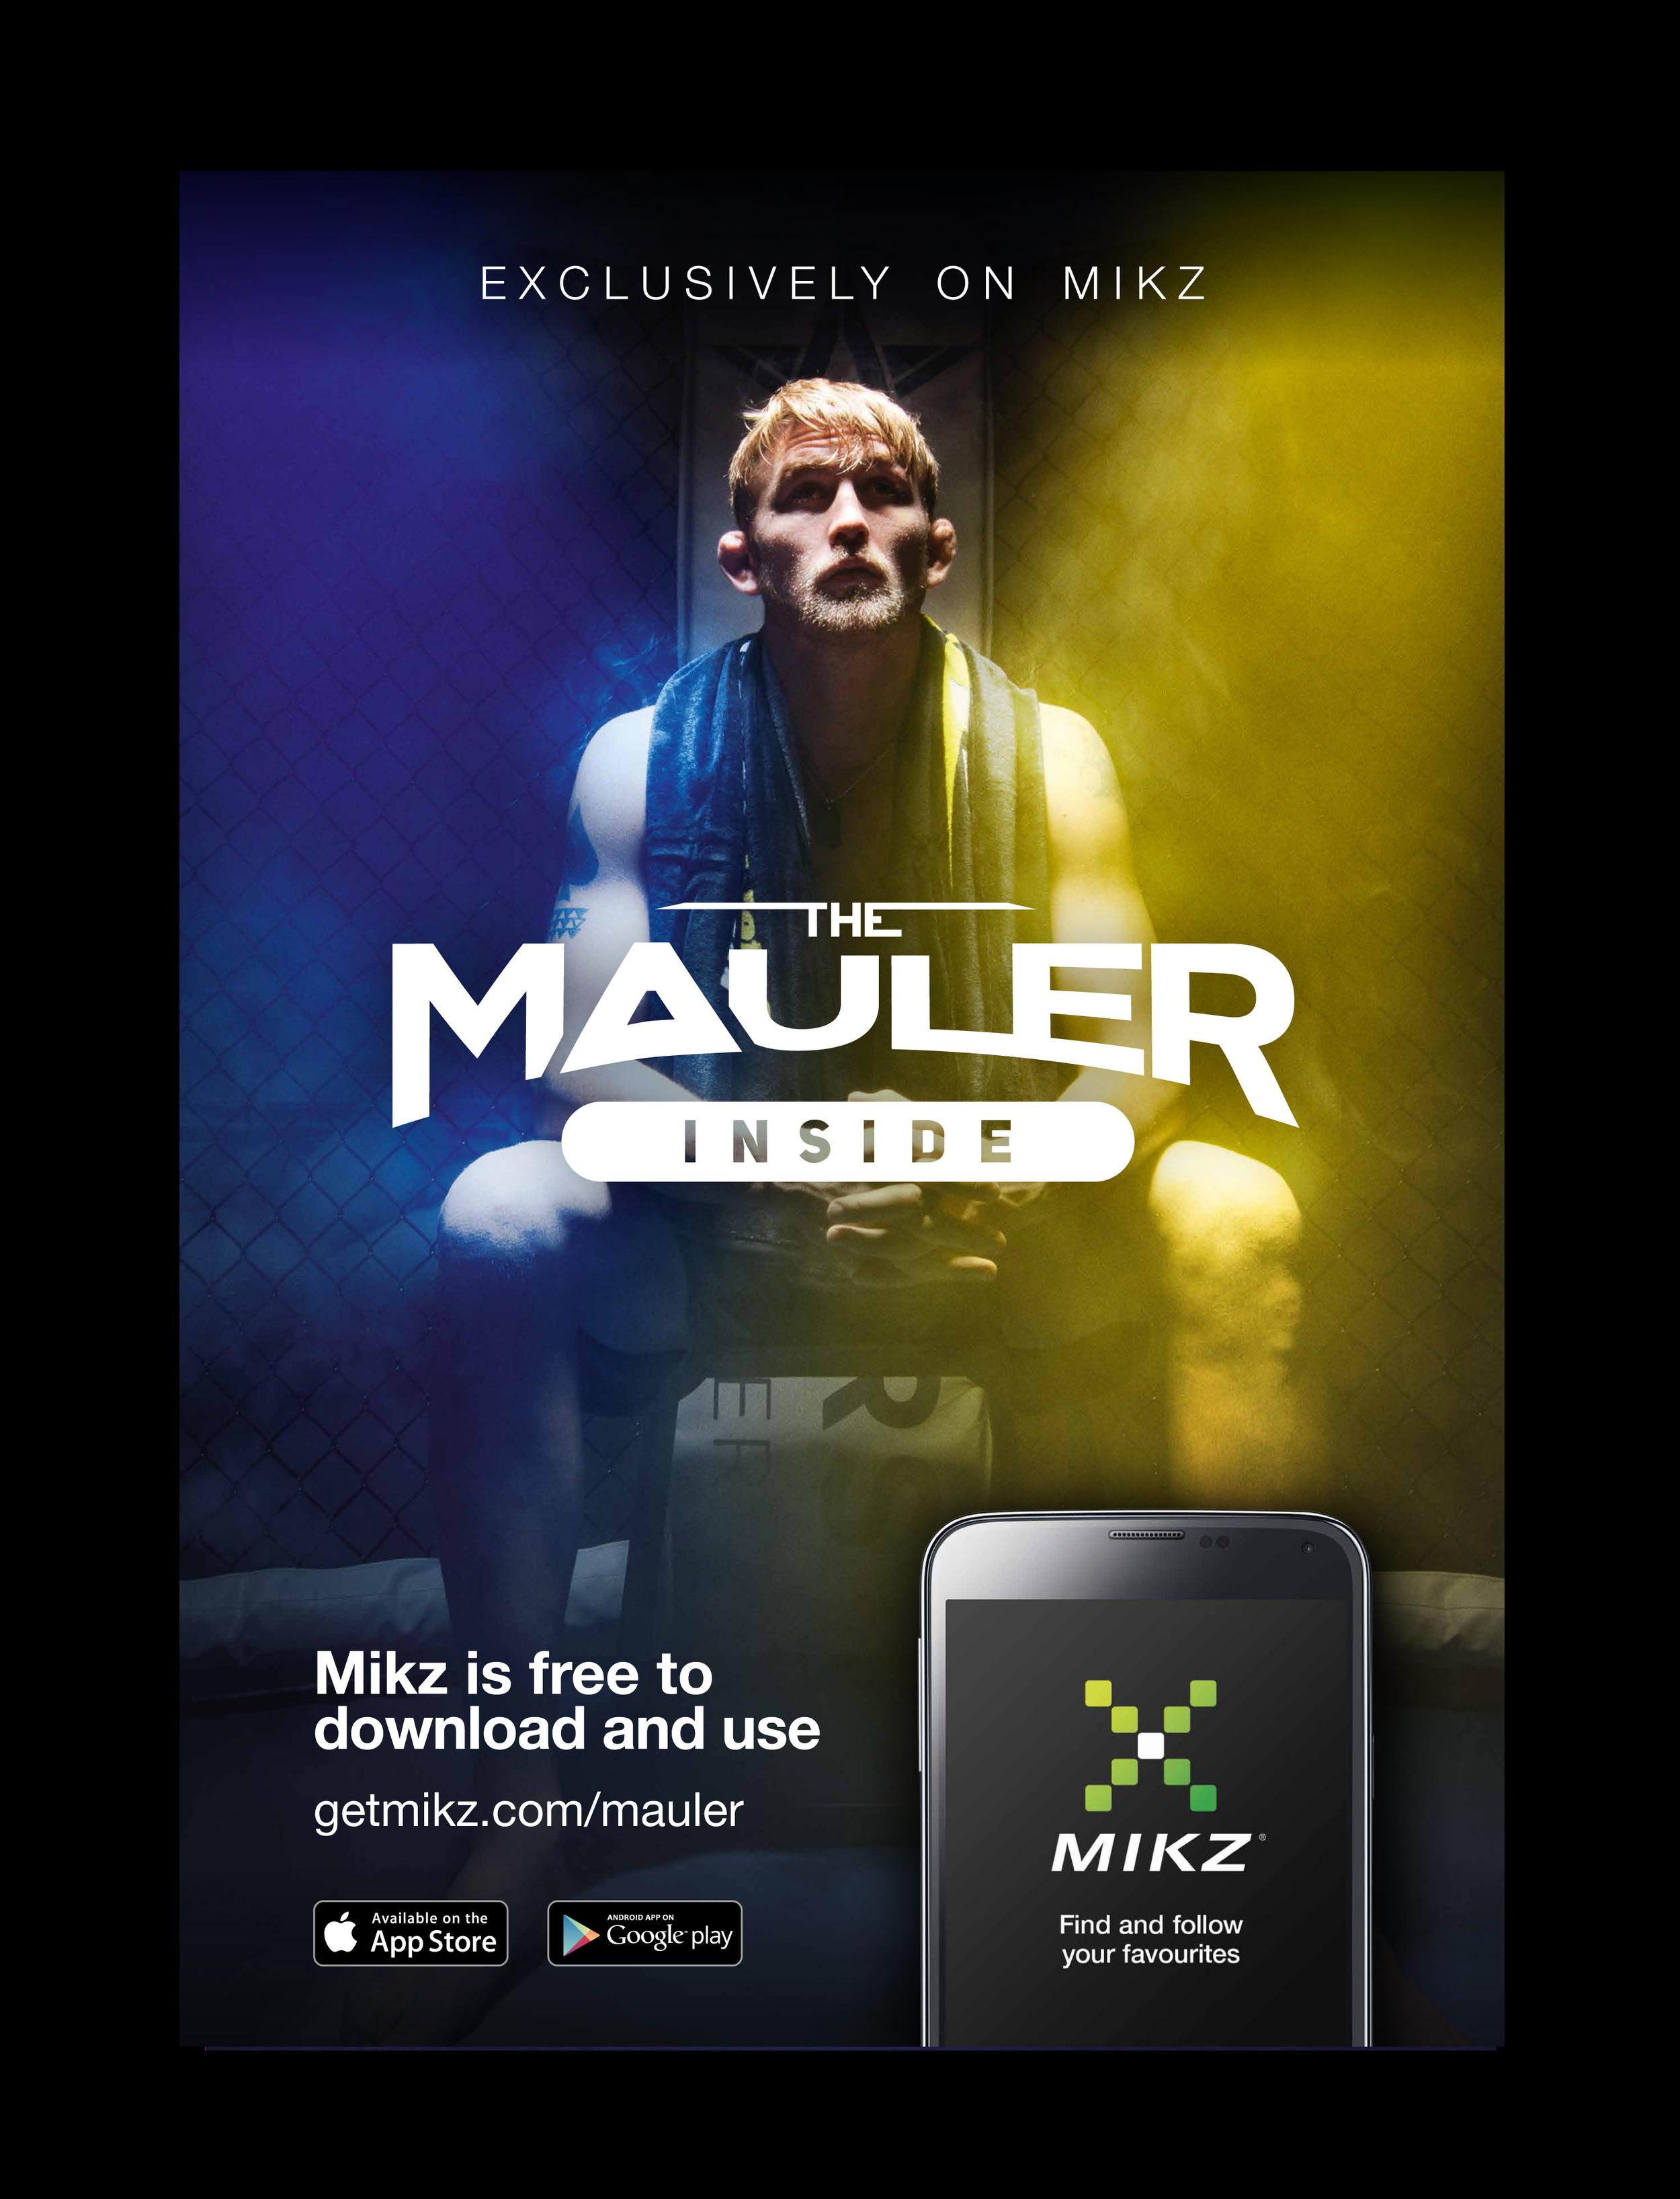 Mikz-Mauler.jpg